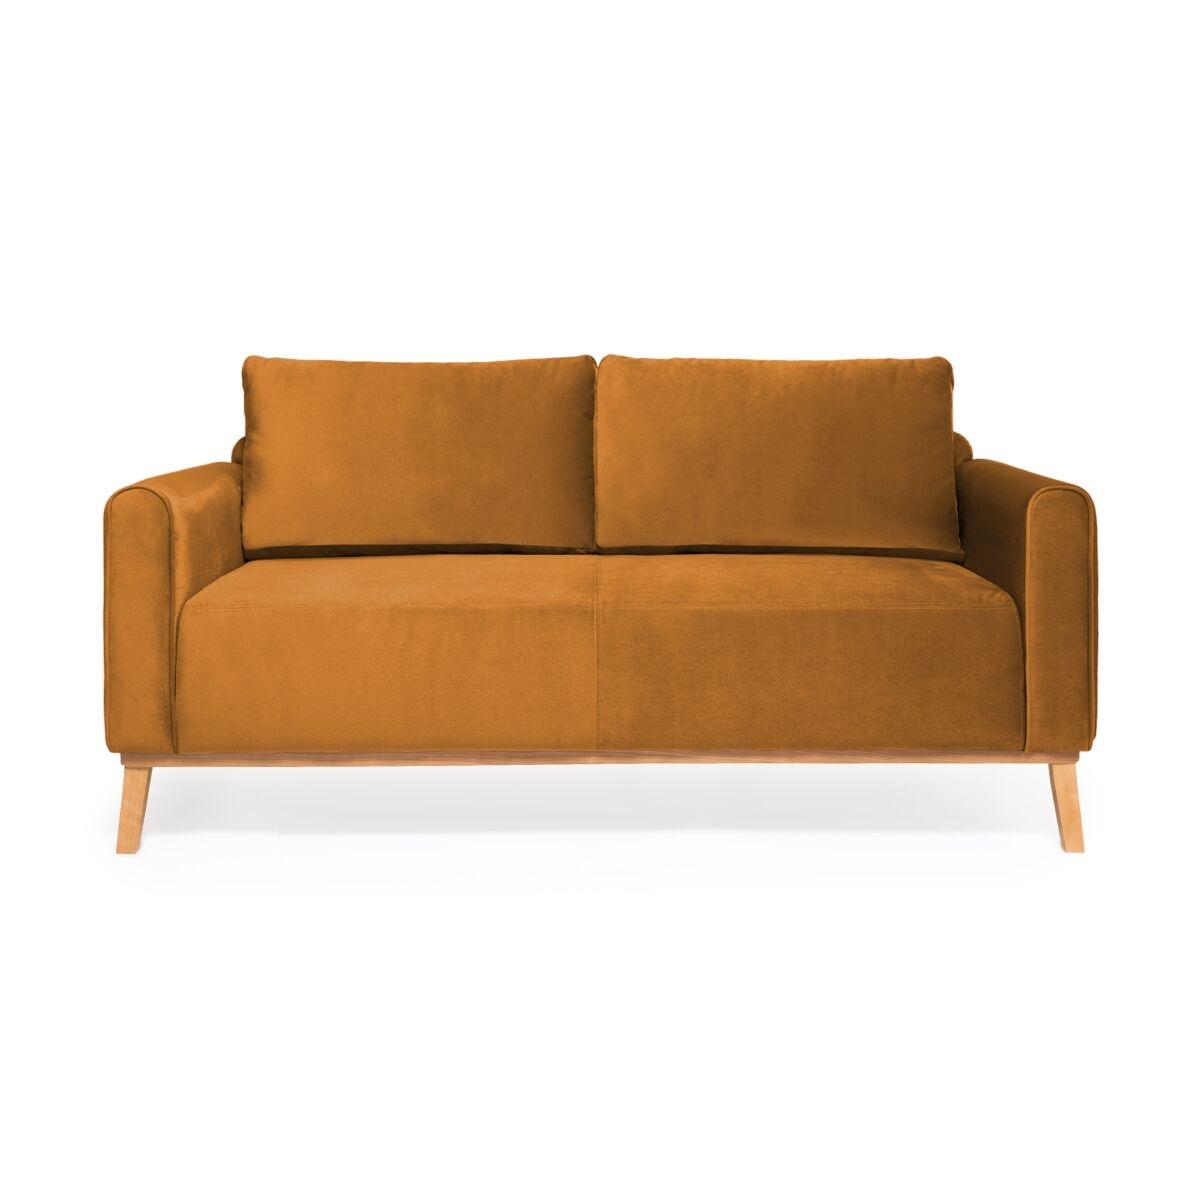 Canapea Fixa 3 locuri Milton Trend Mustard